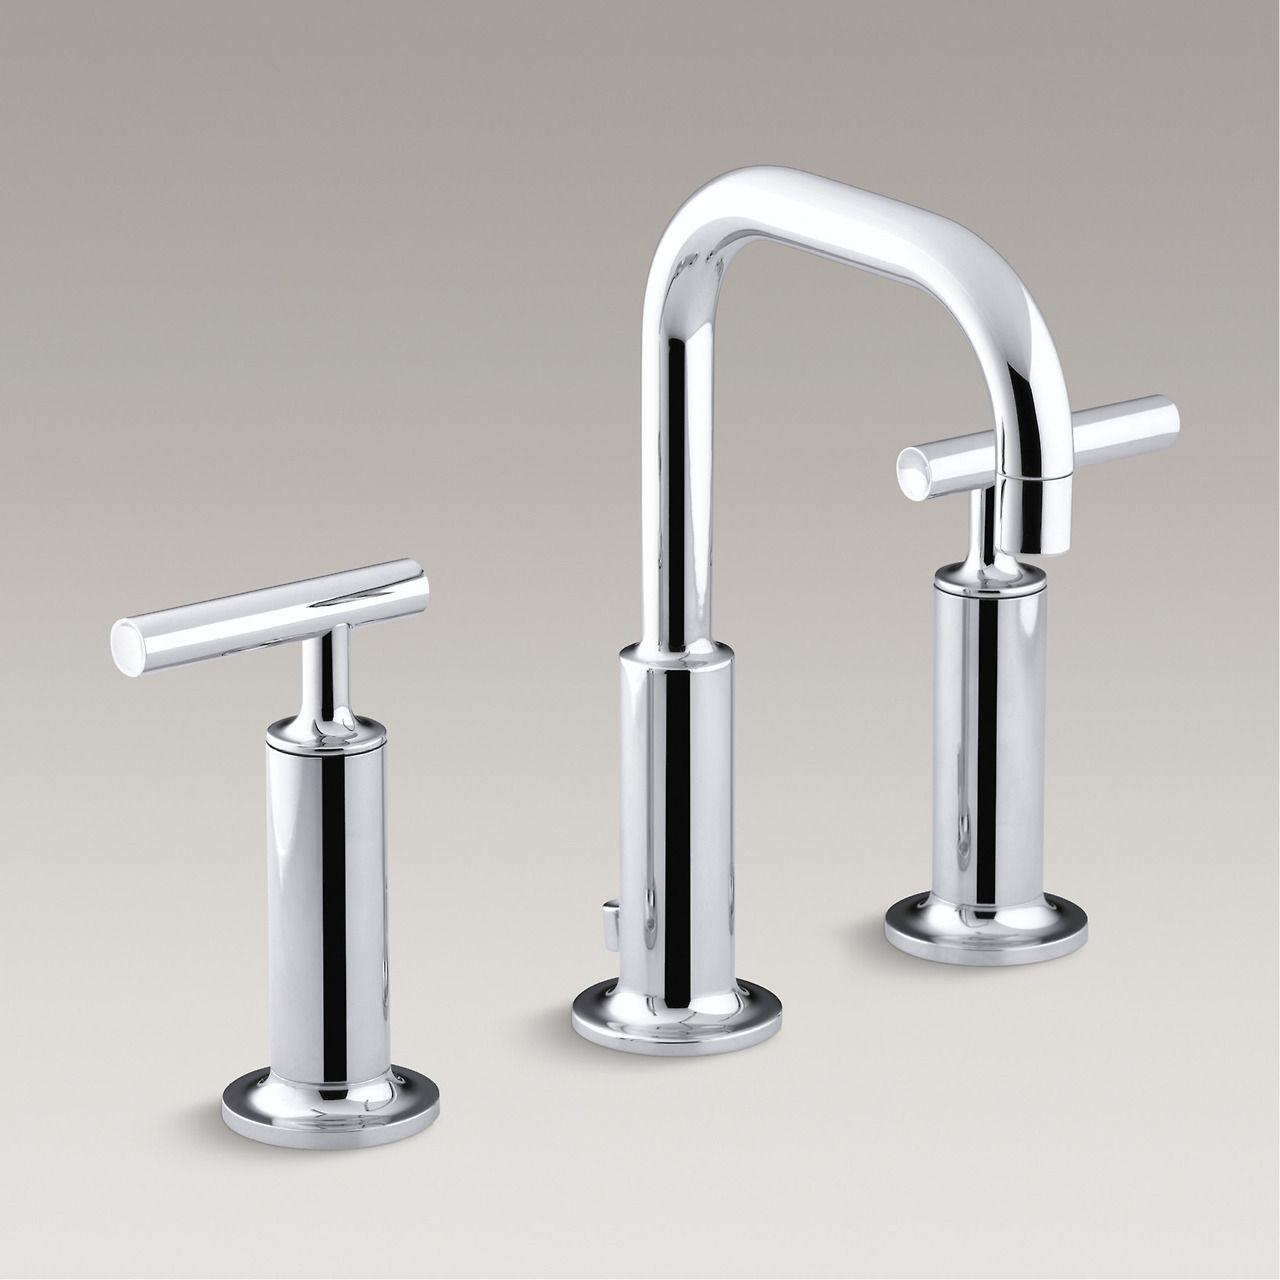 Kohler Badarmaturen bold ideas from kohler faucets wasserhähne ideen